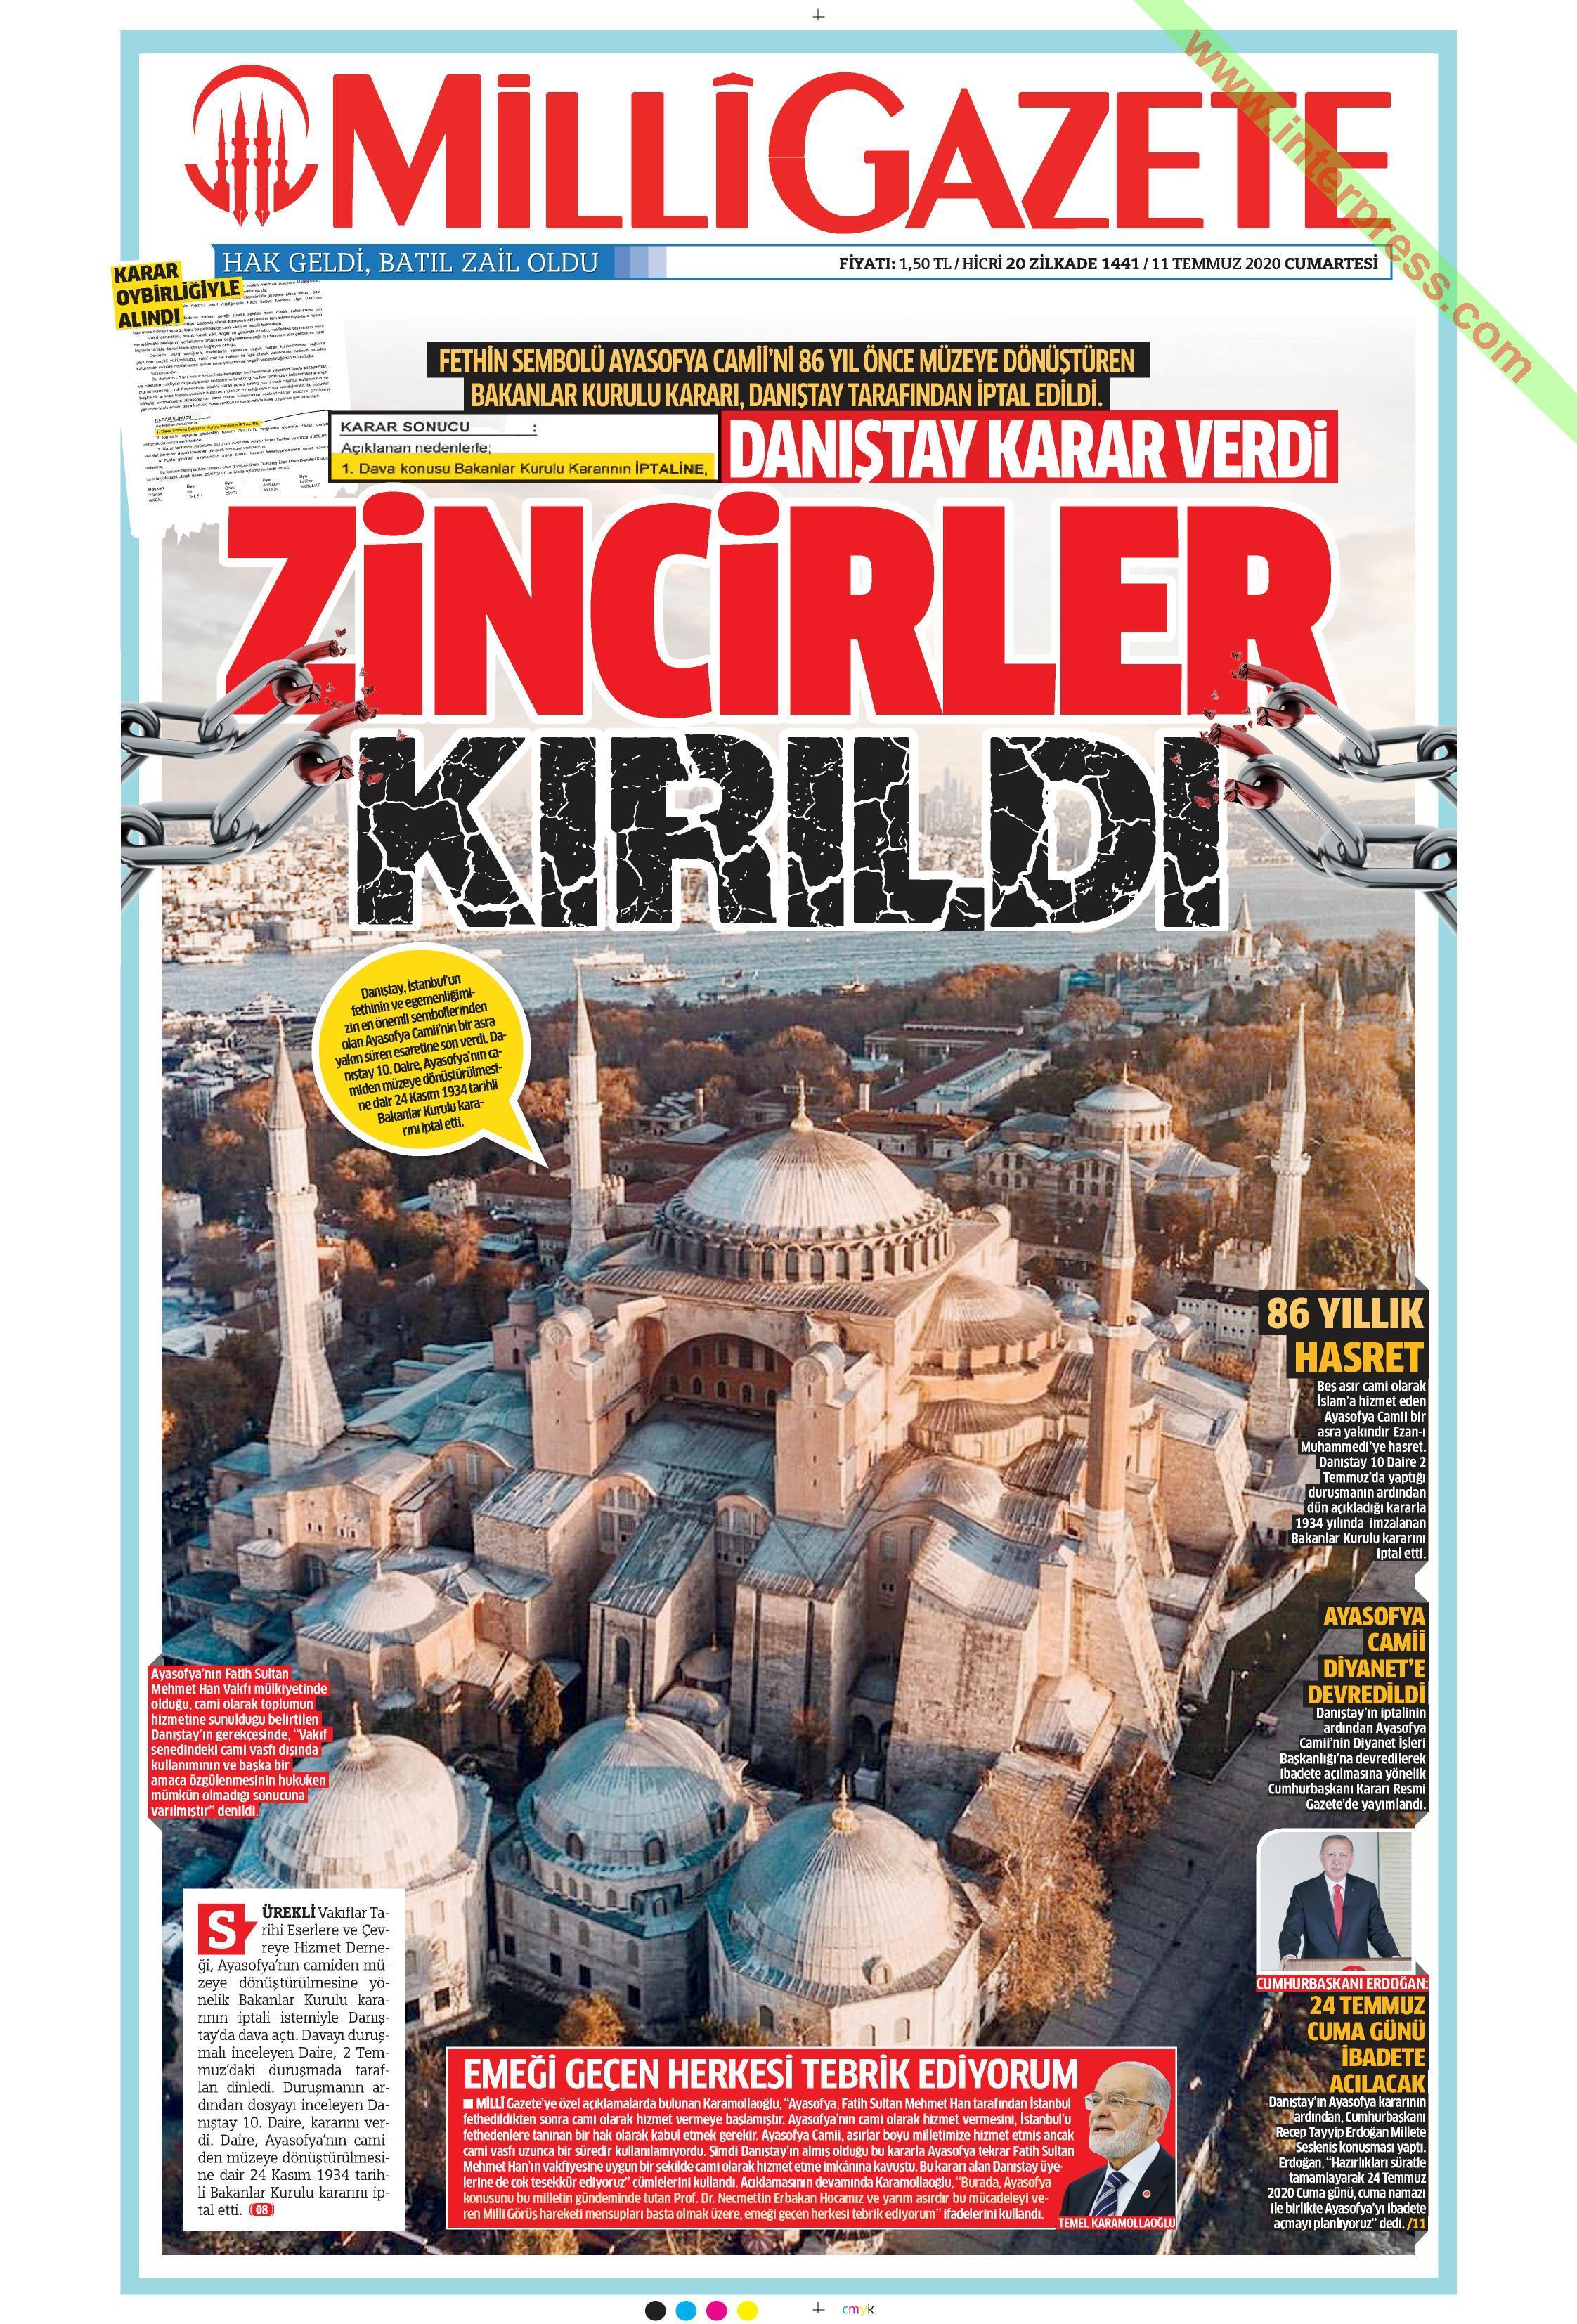 Milli Gazete gazetesi manşet ilk sayfa oku